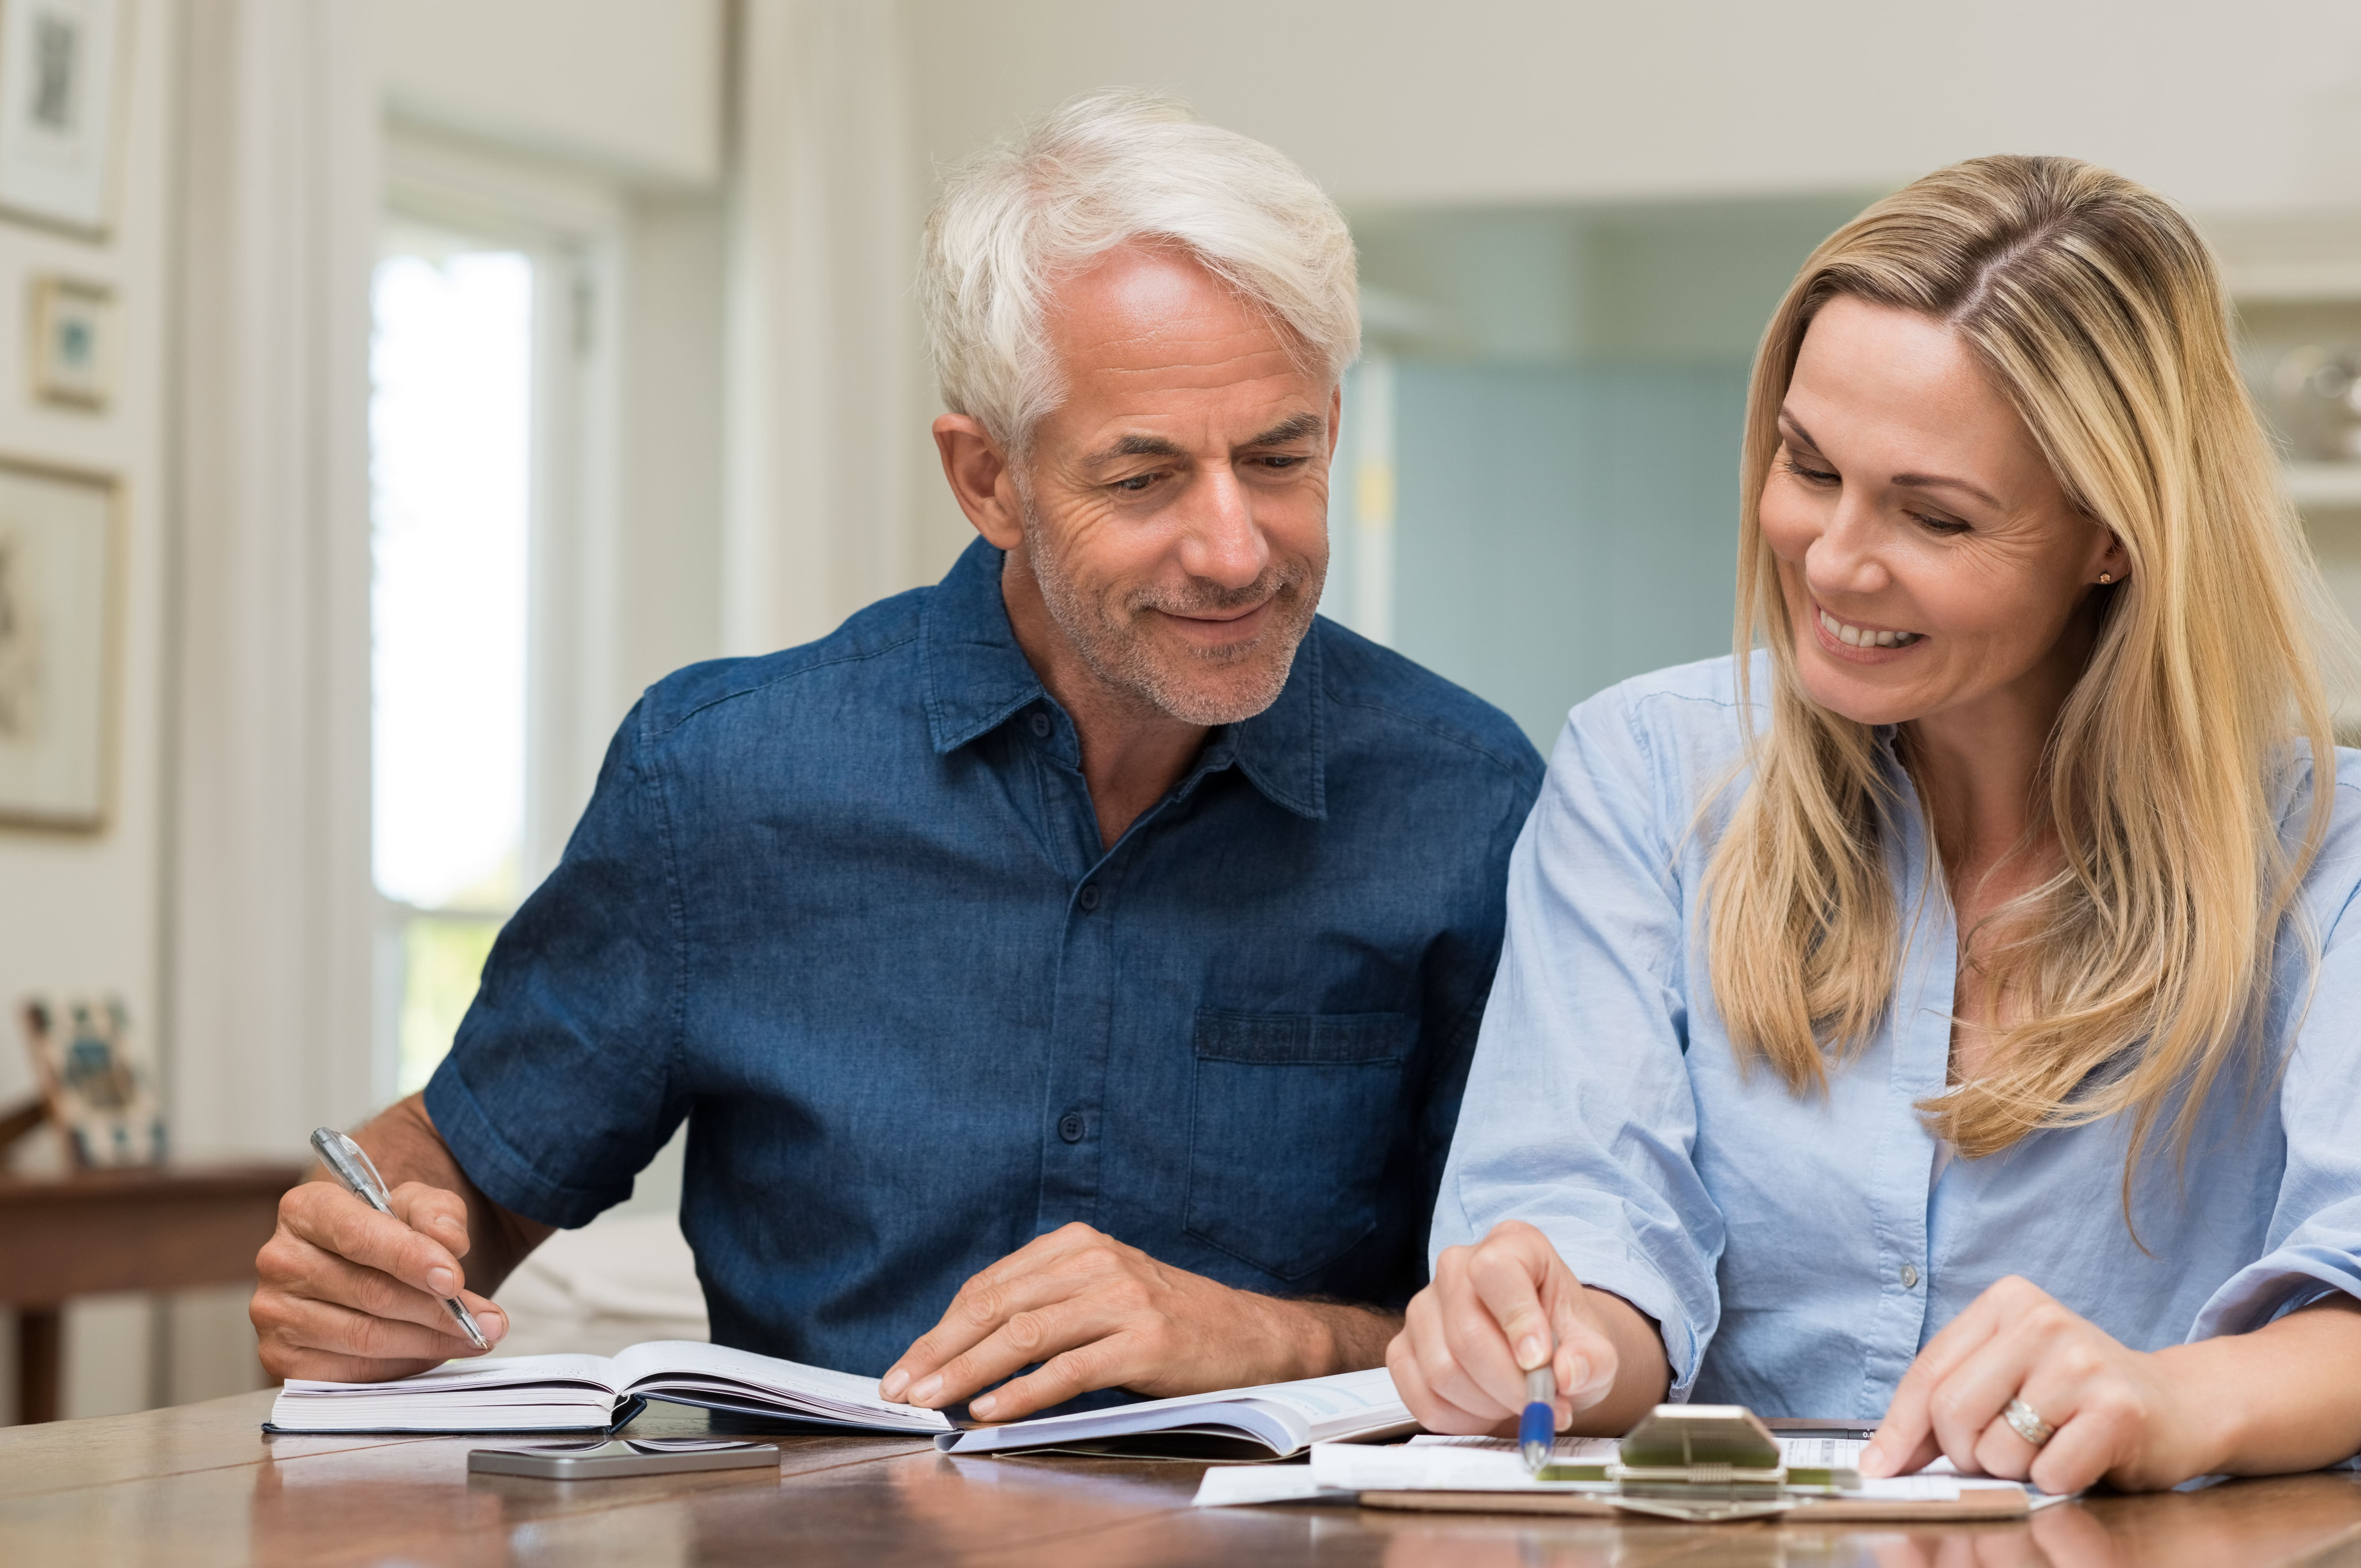 Couple-discussing-home-economics